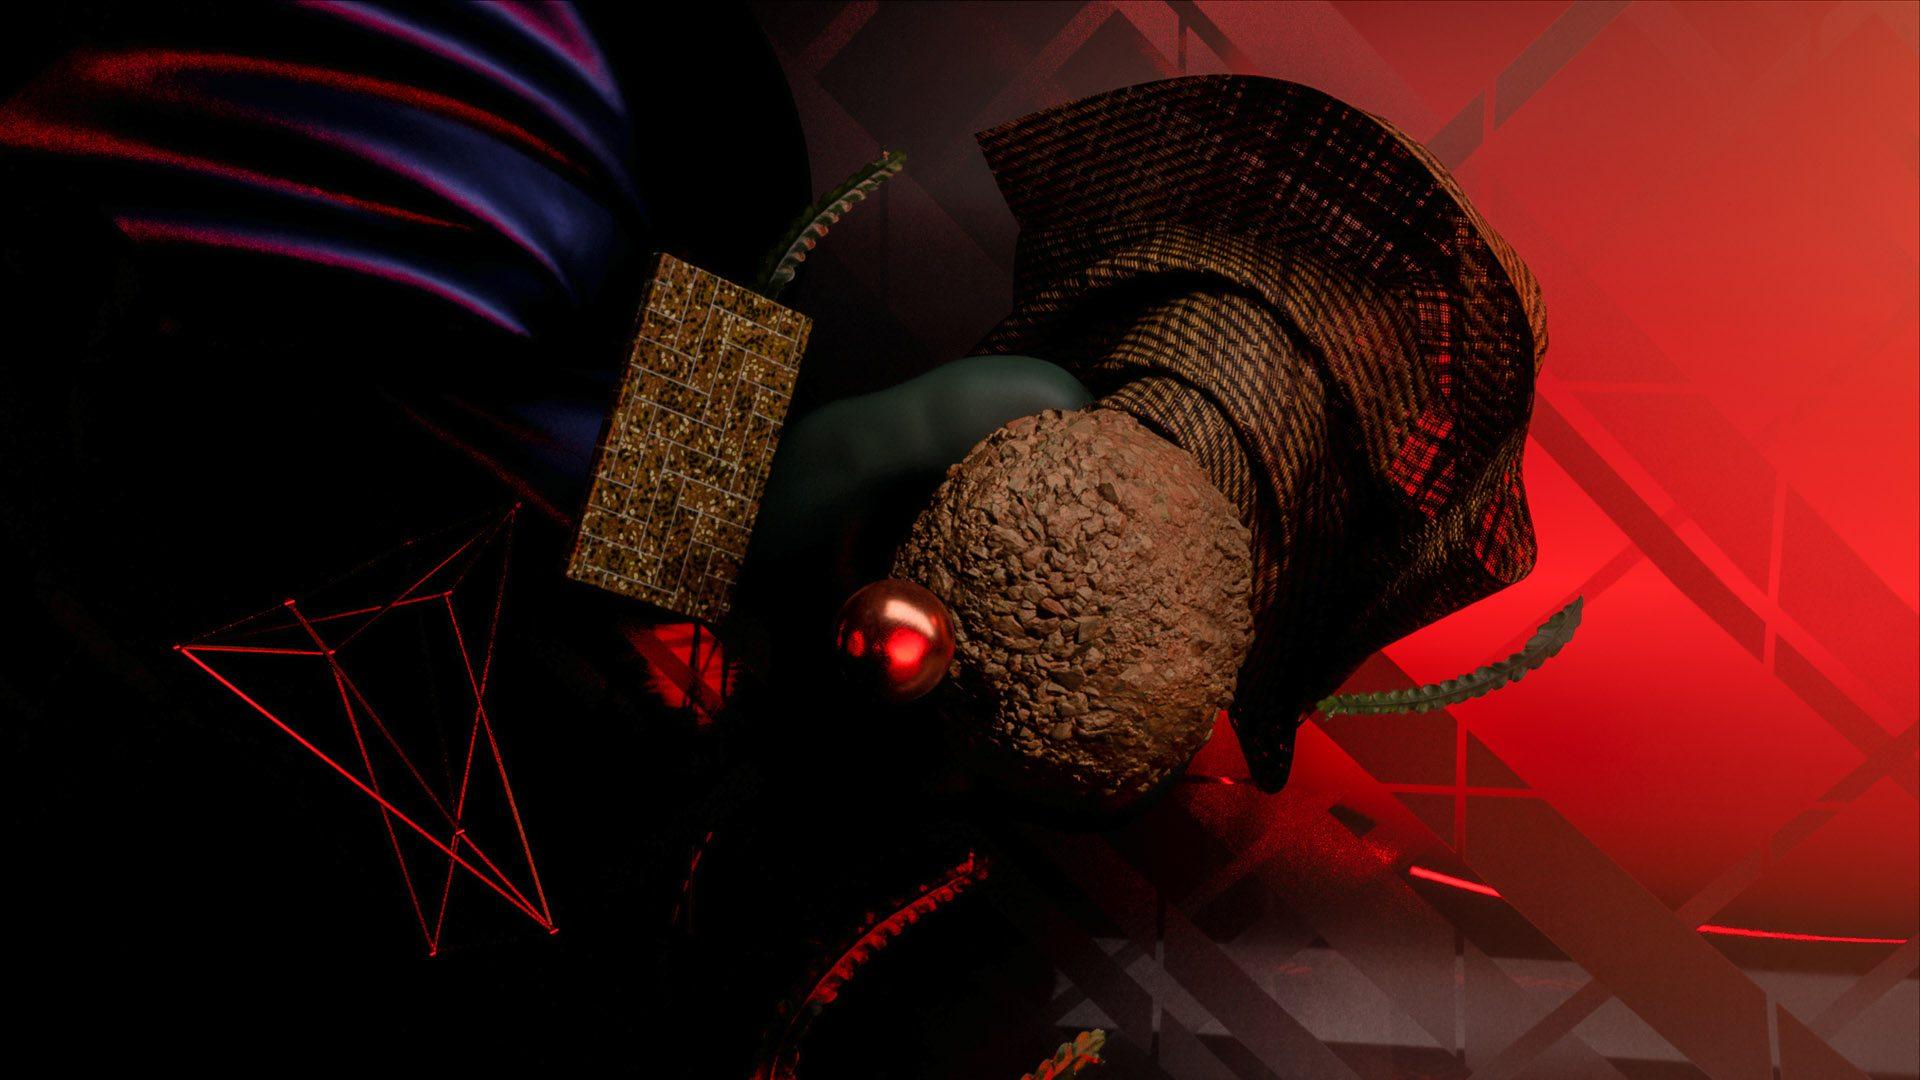 Material, materialarts, textura, 3d, worldbuilding, 3dmodeling, design, 3drendering, sculpt, substance, 3dart, substancedesigner, madewithsubstance, substance3d, gameart, b3d, gameassets, digital3d, unity3d, stylizedstation, cgiartist, 3dtexturing